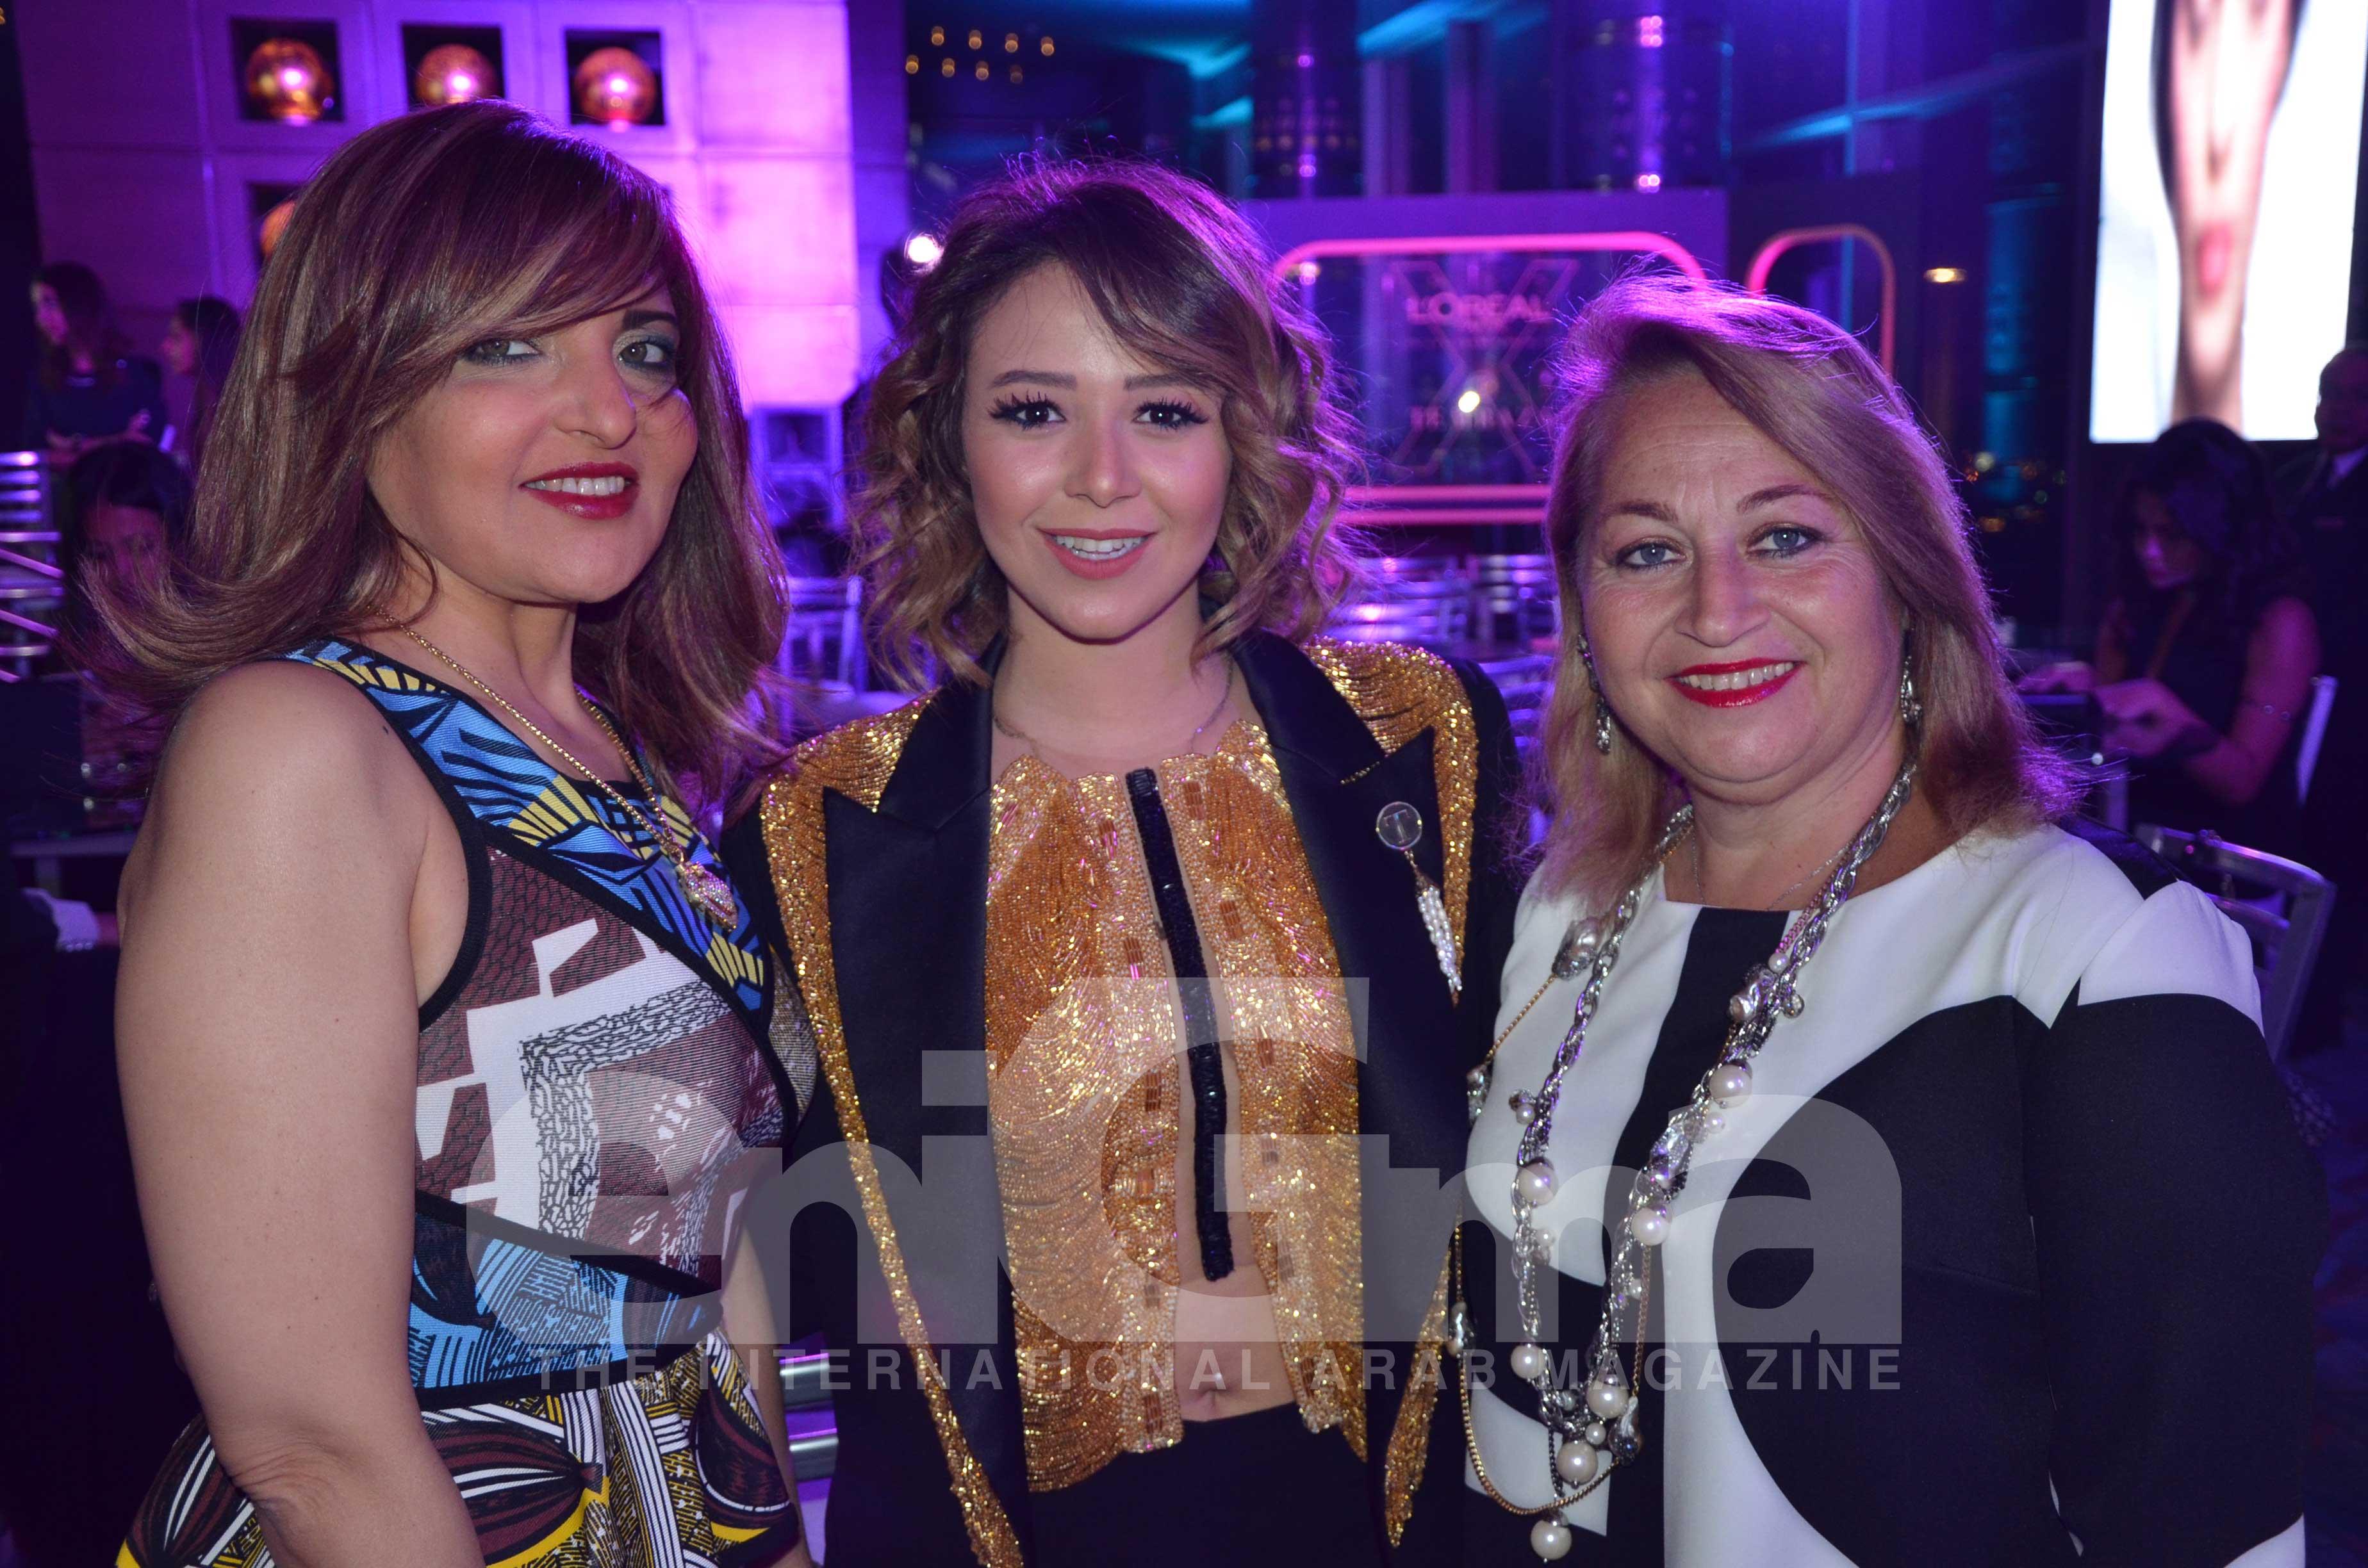 Ms. Amany El Cherif, Ms. Farida Temraz & Ms. Rania Madkour